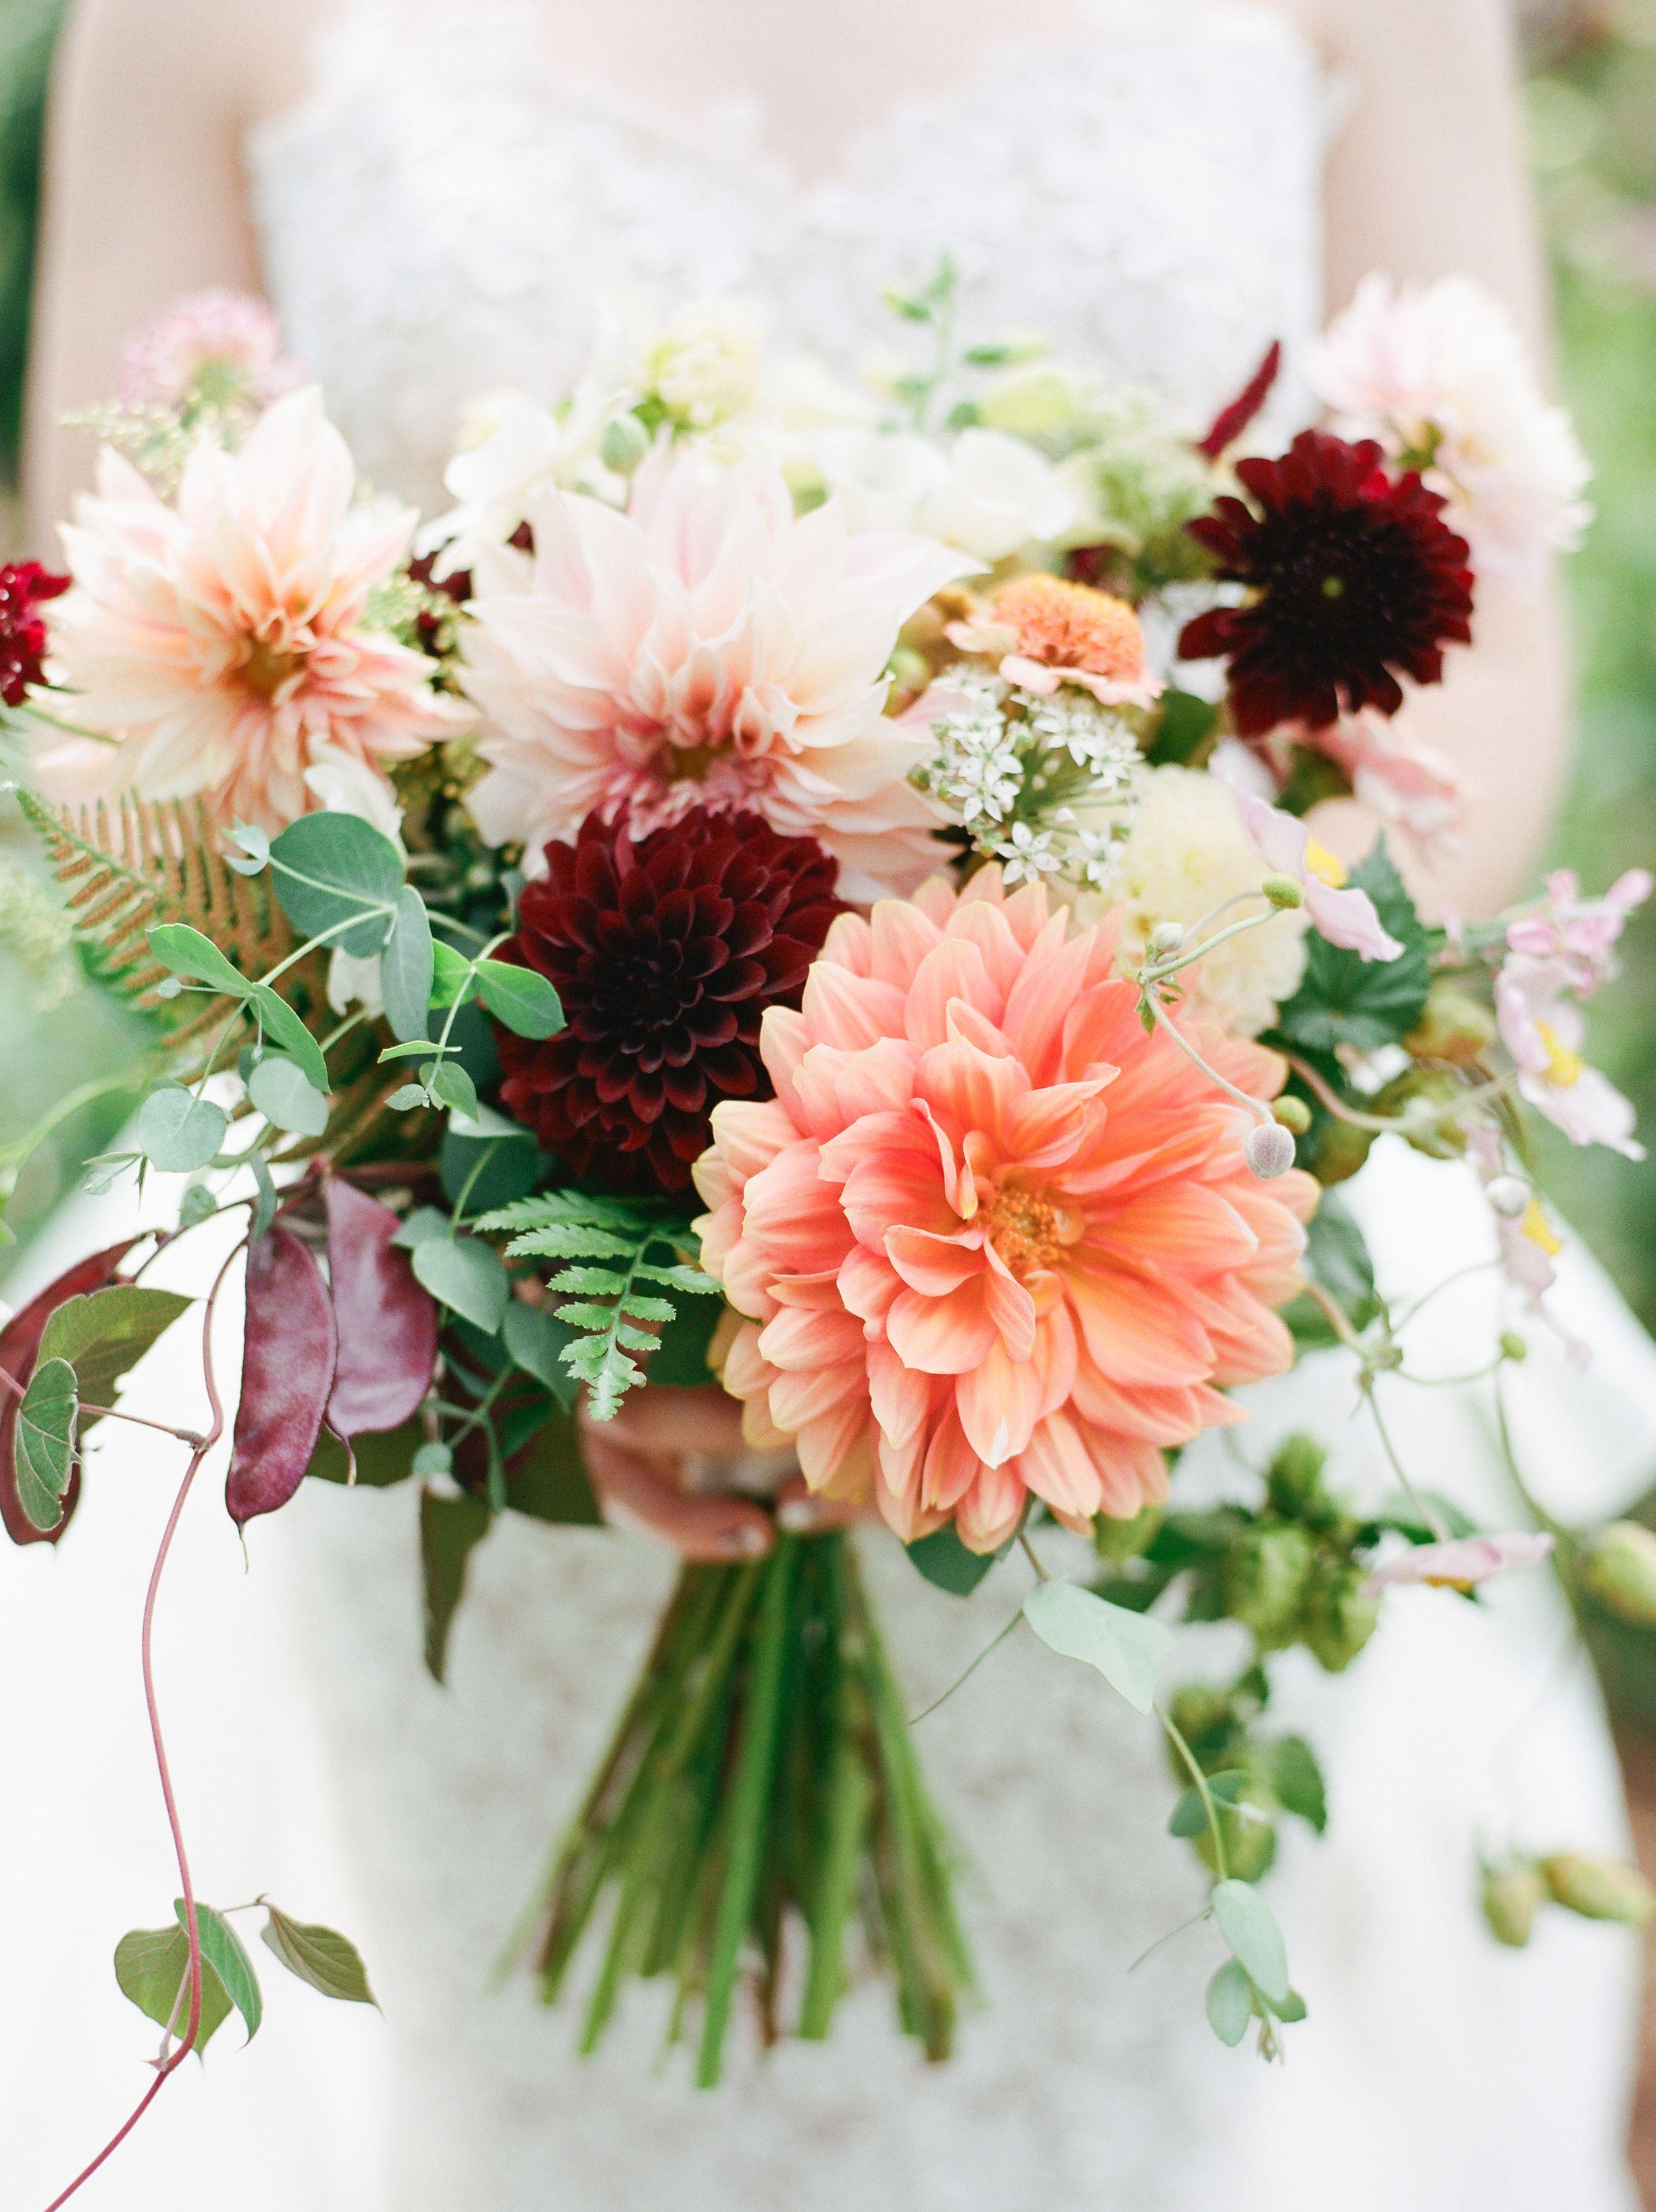 Home Bridal bouquet fall, Early fall weddings, Dahlia